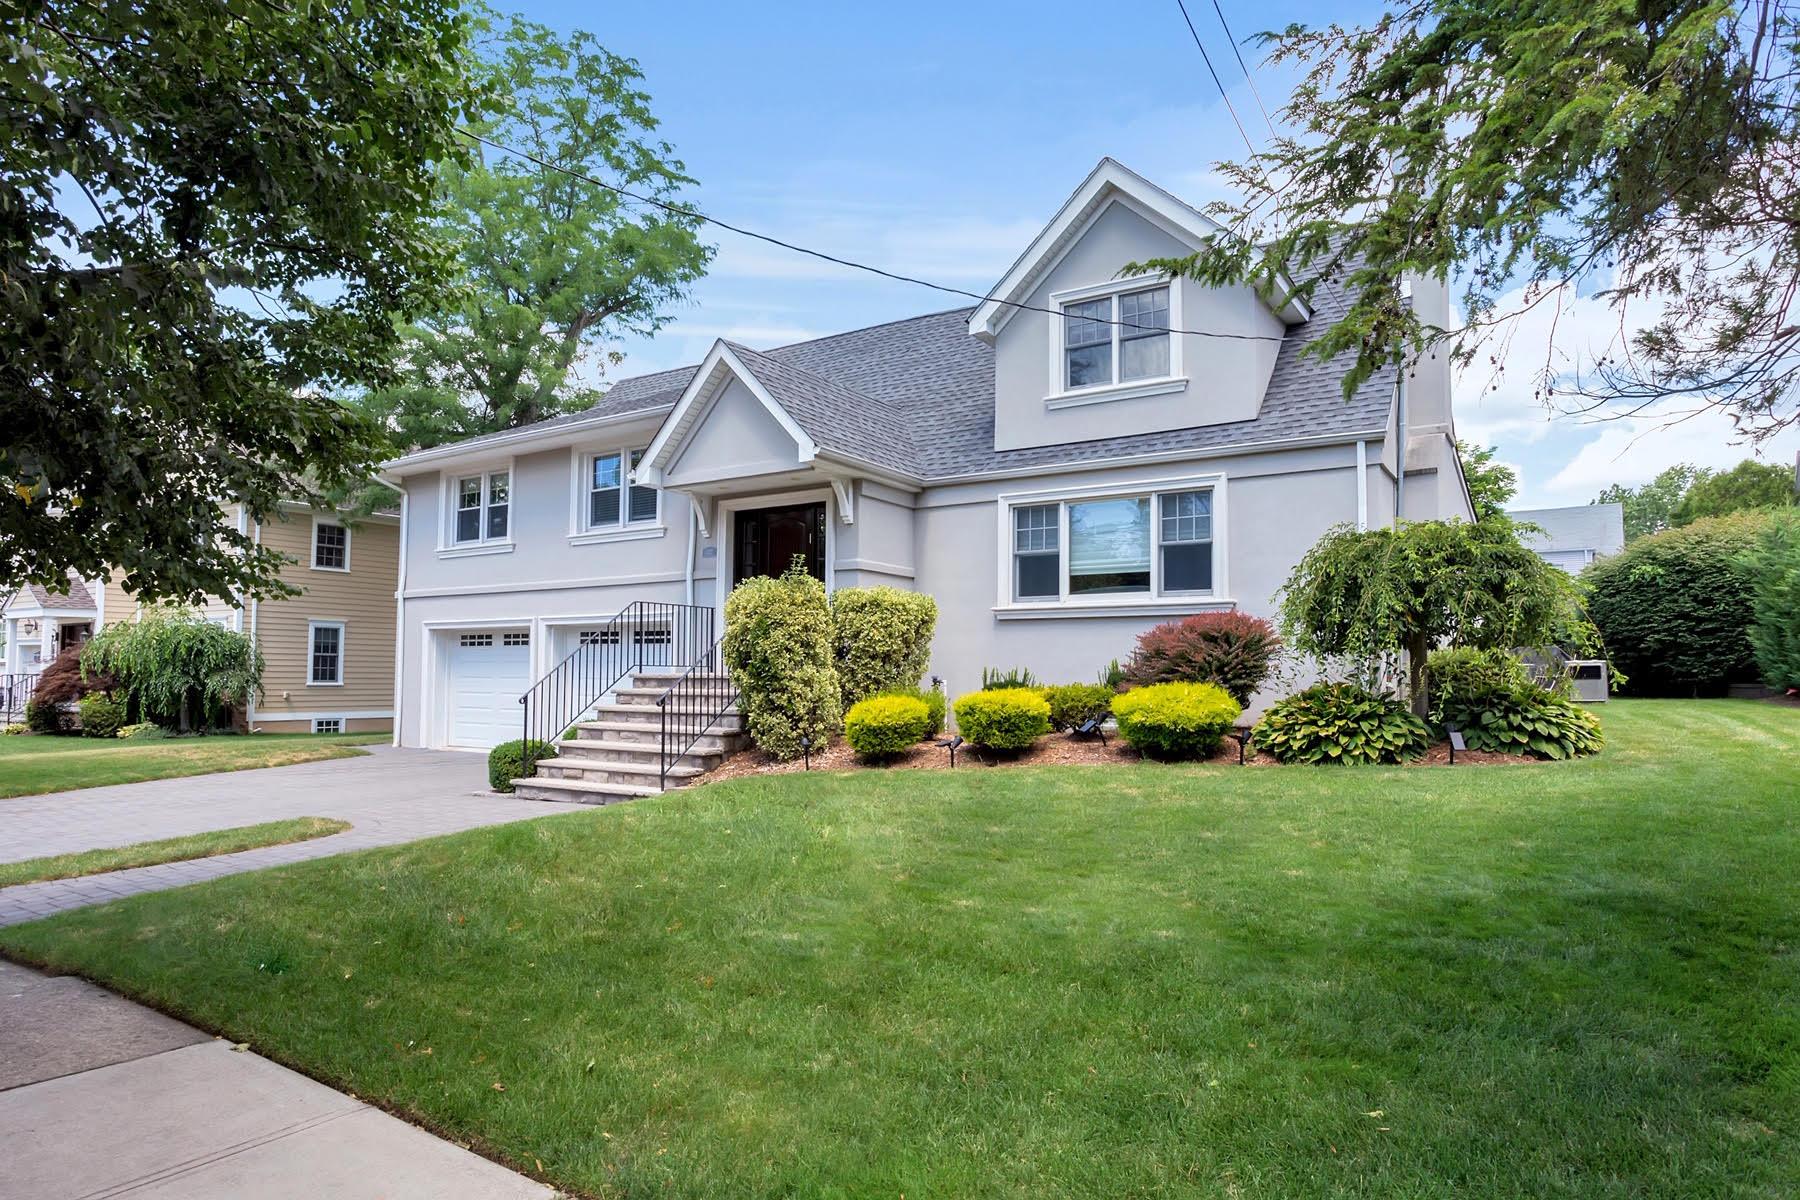 527 Grenville Avenue – Teaneck